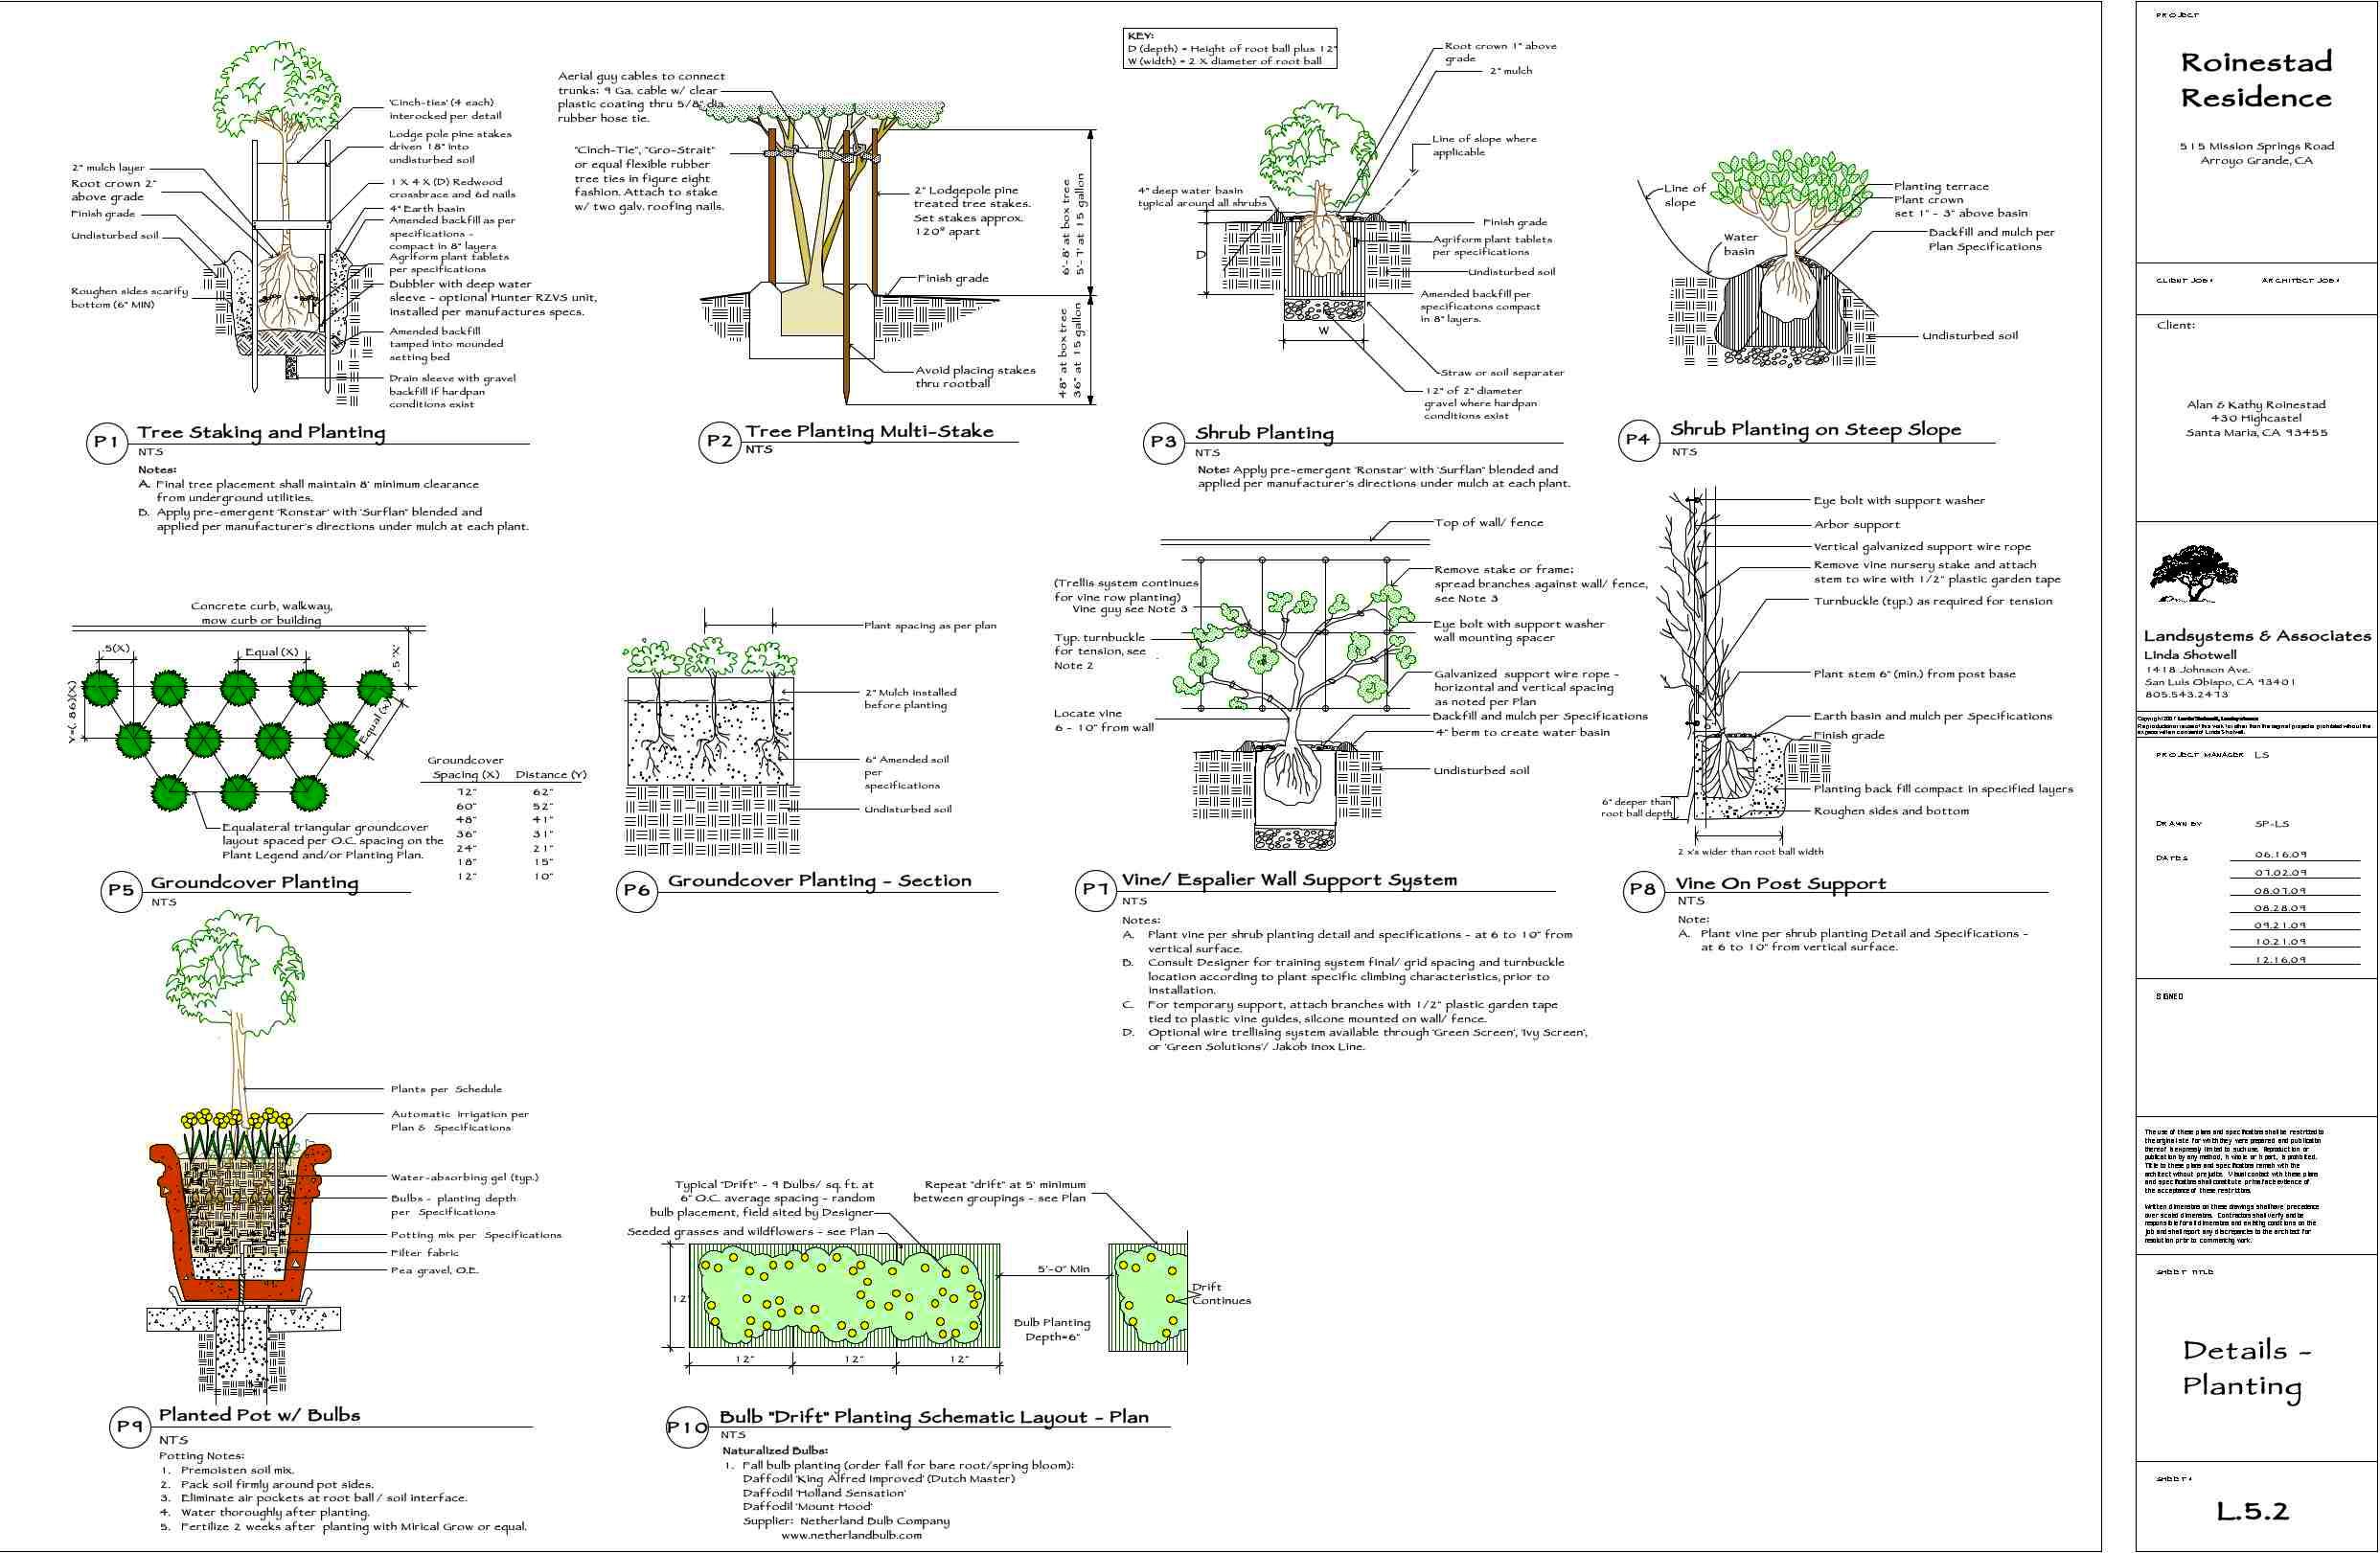 roinestad-detail-planting